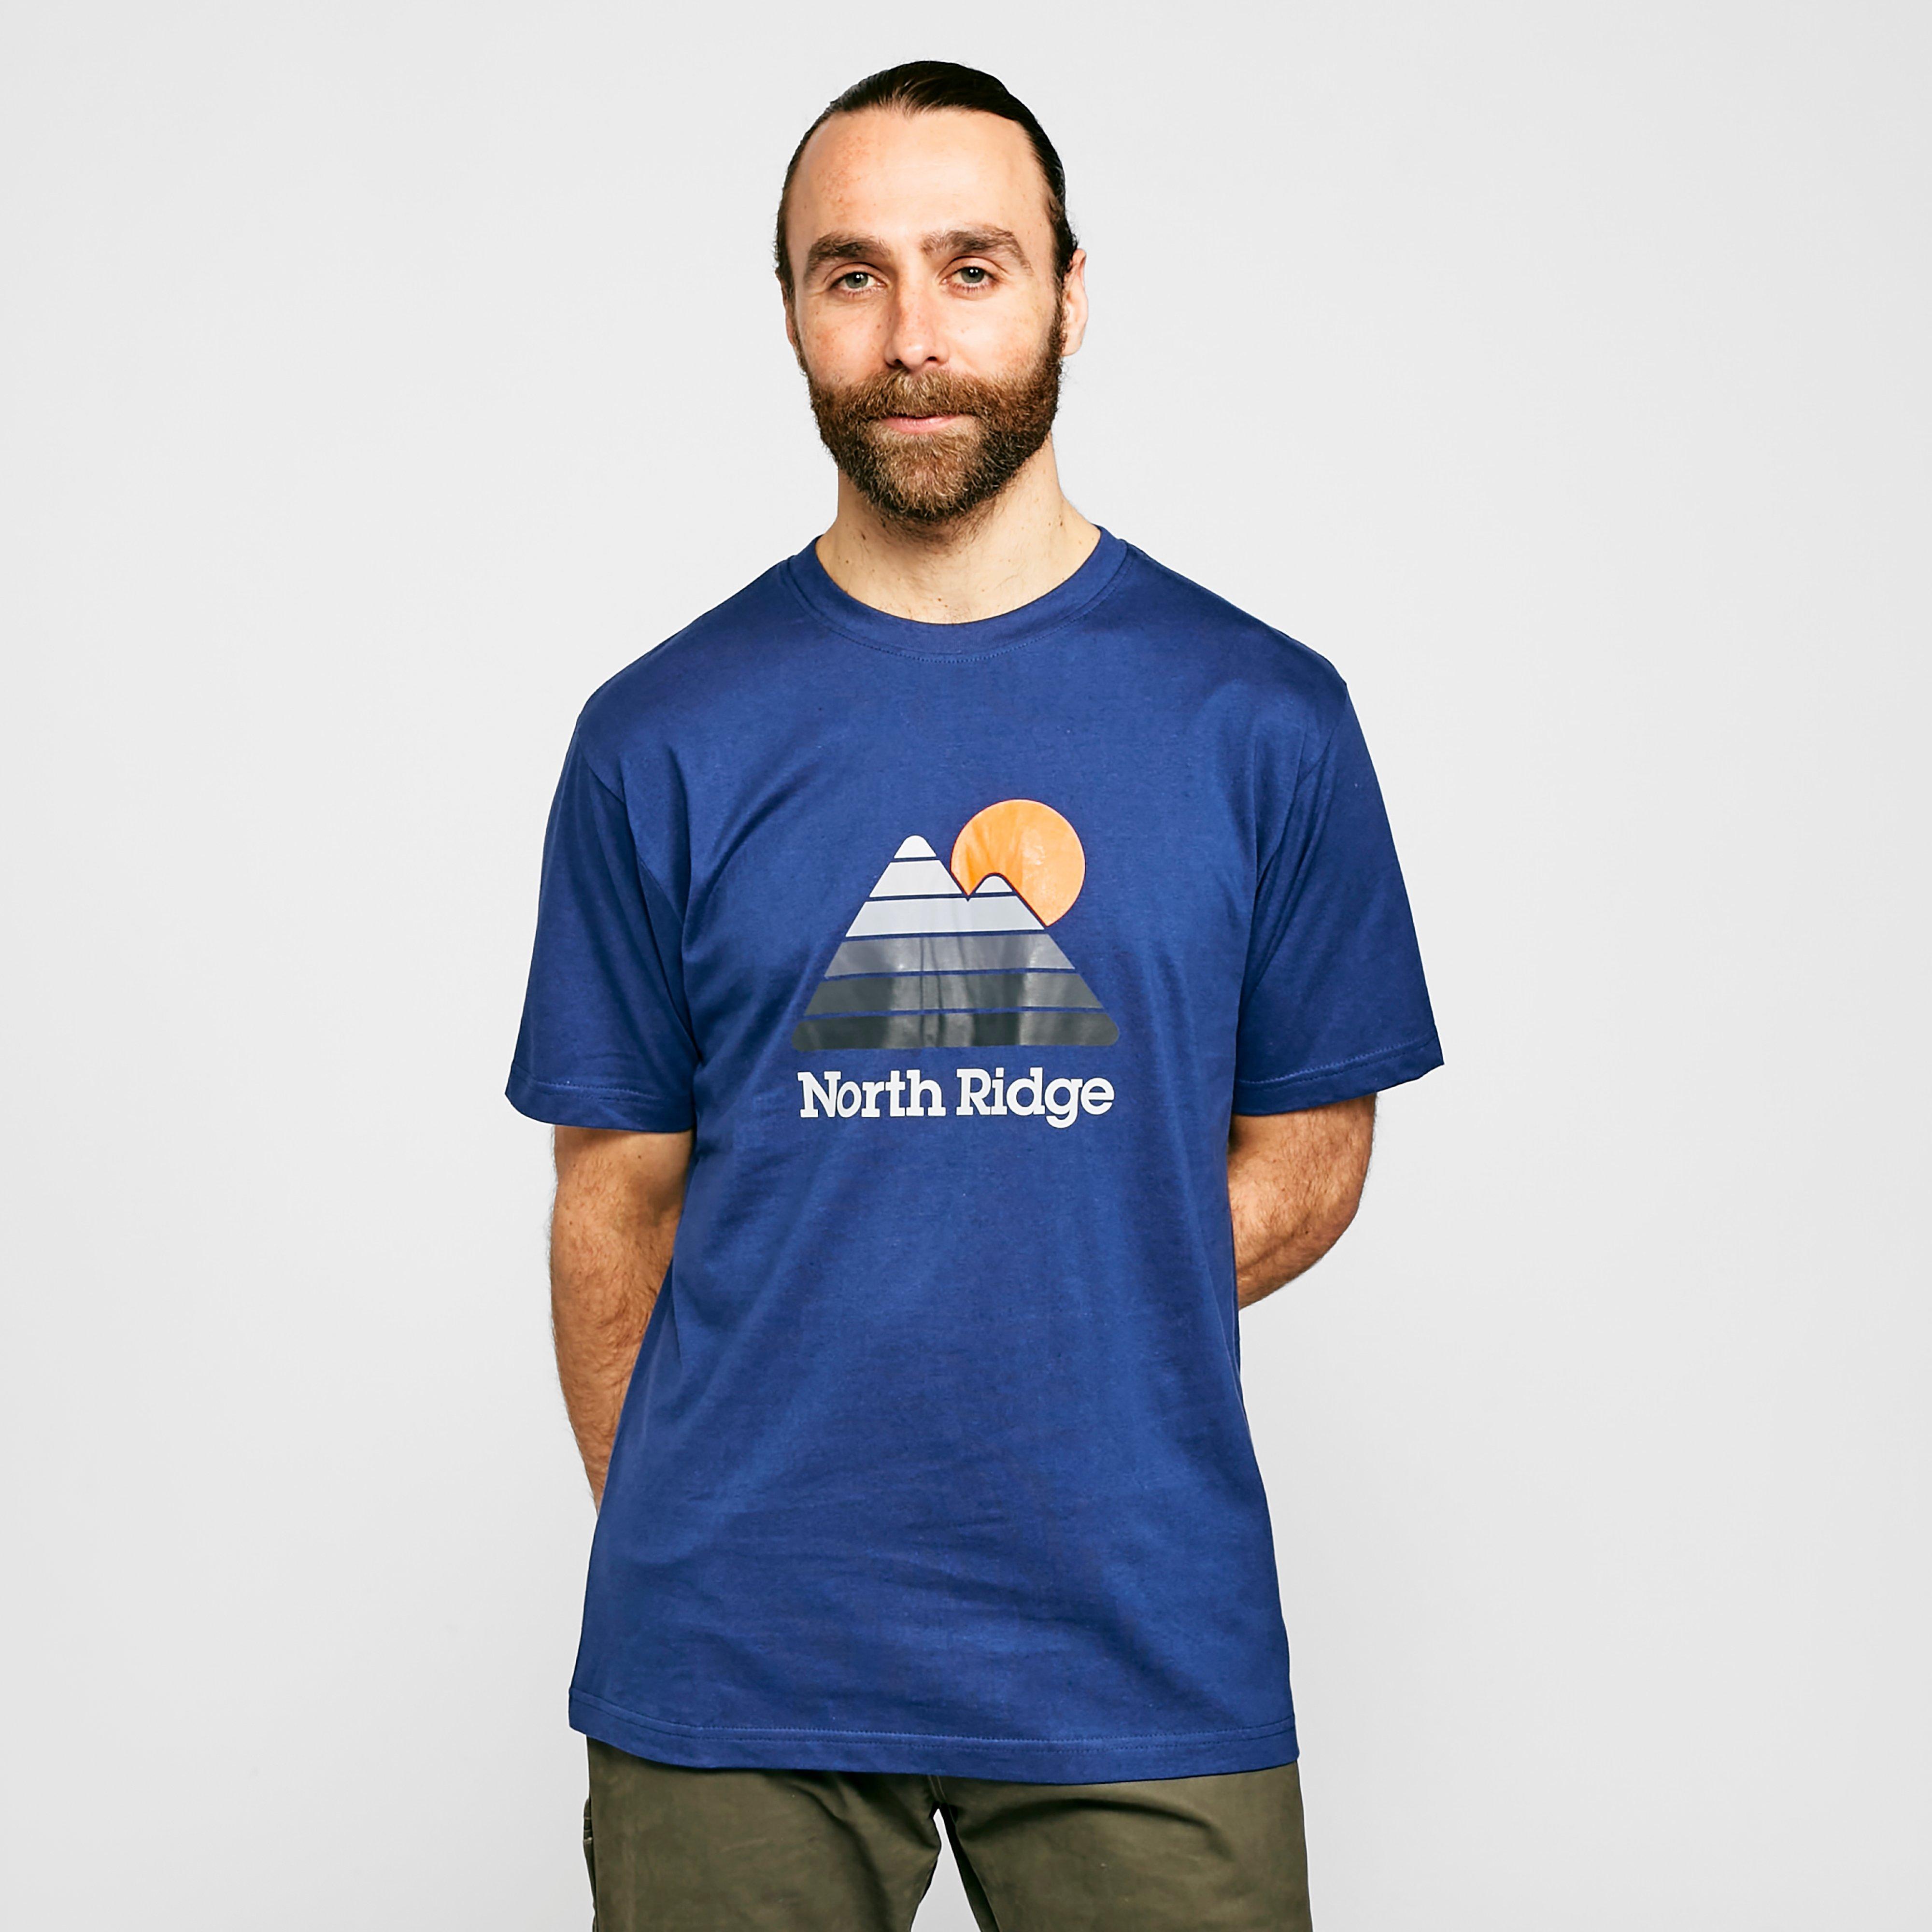 North Ridge Mens 90s T-shirt - Blue/nvy  Blue/nvy